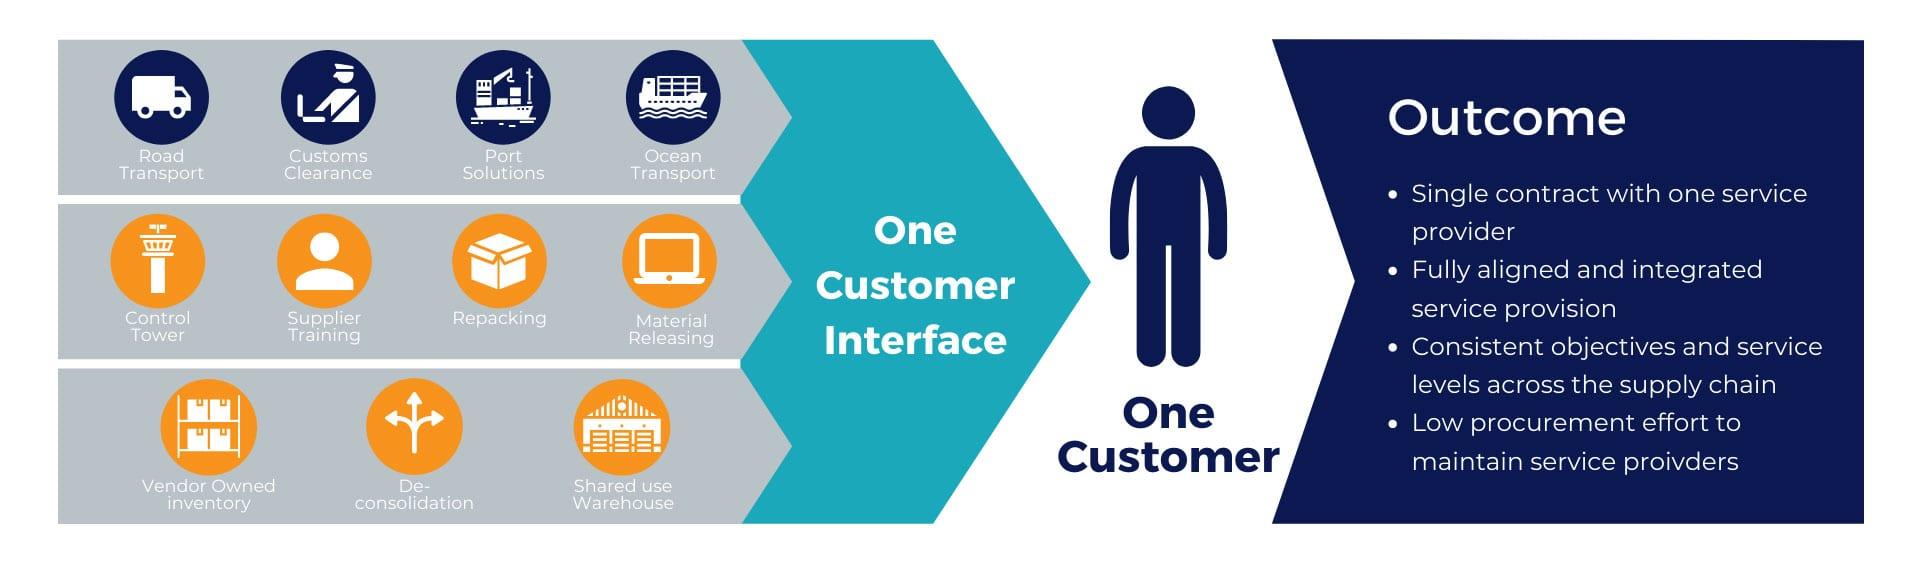 One Customer Interface